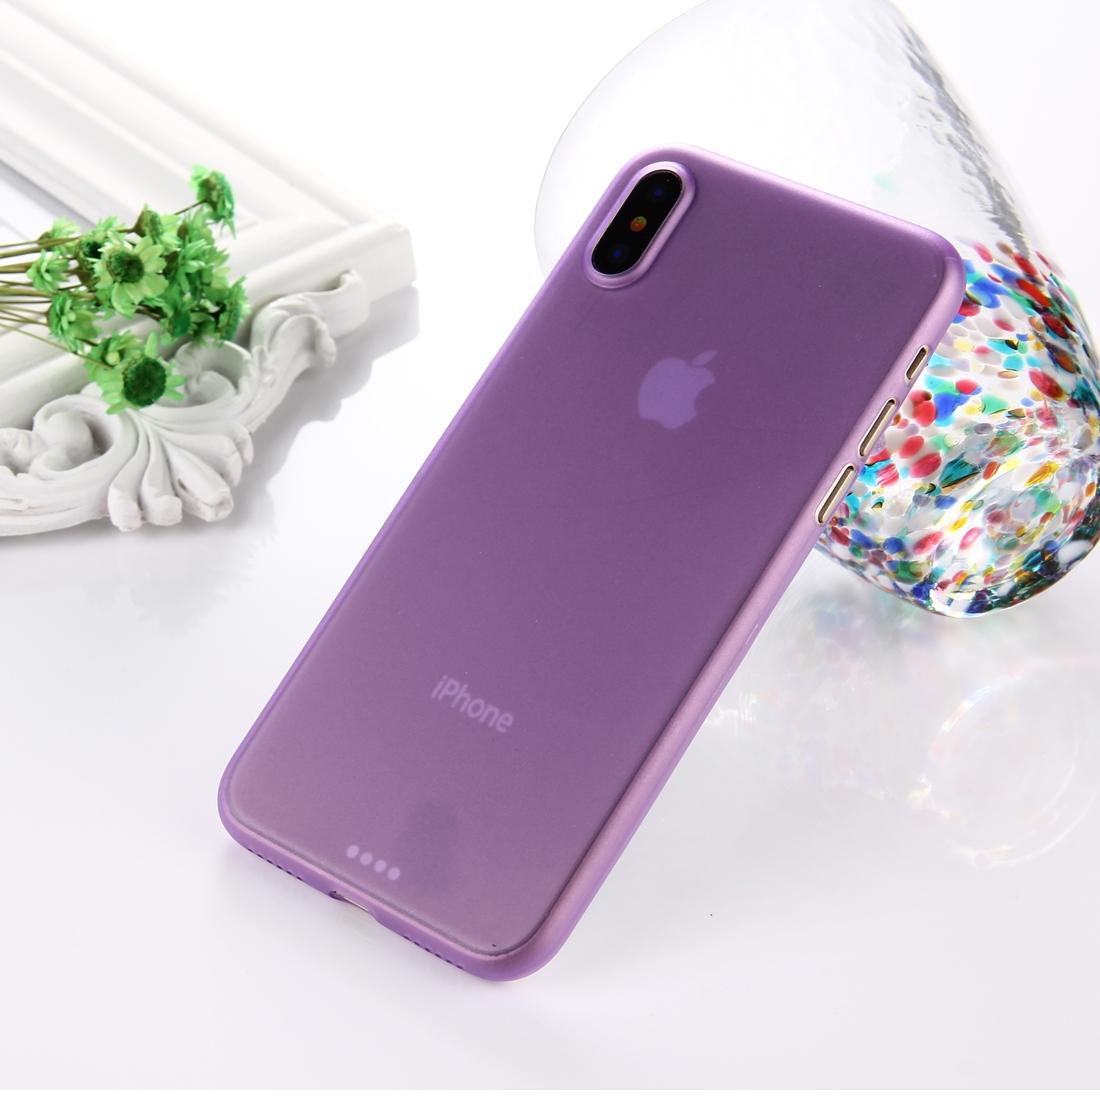 Buy iPhone XR - Apple